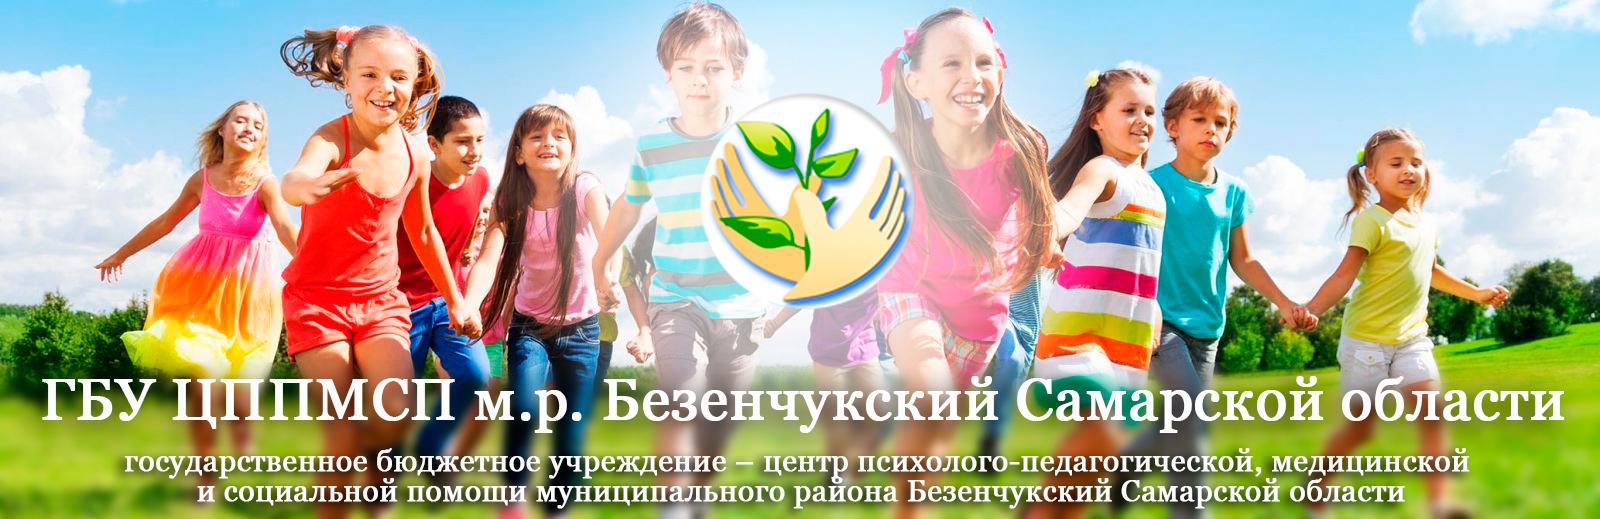 ГБУ ЦППМСП м.р. Безенчукский Самарской области